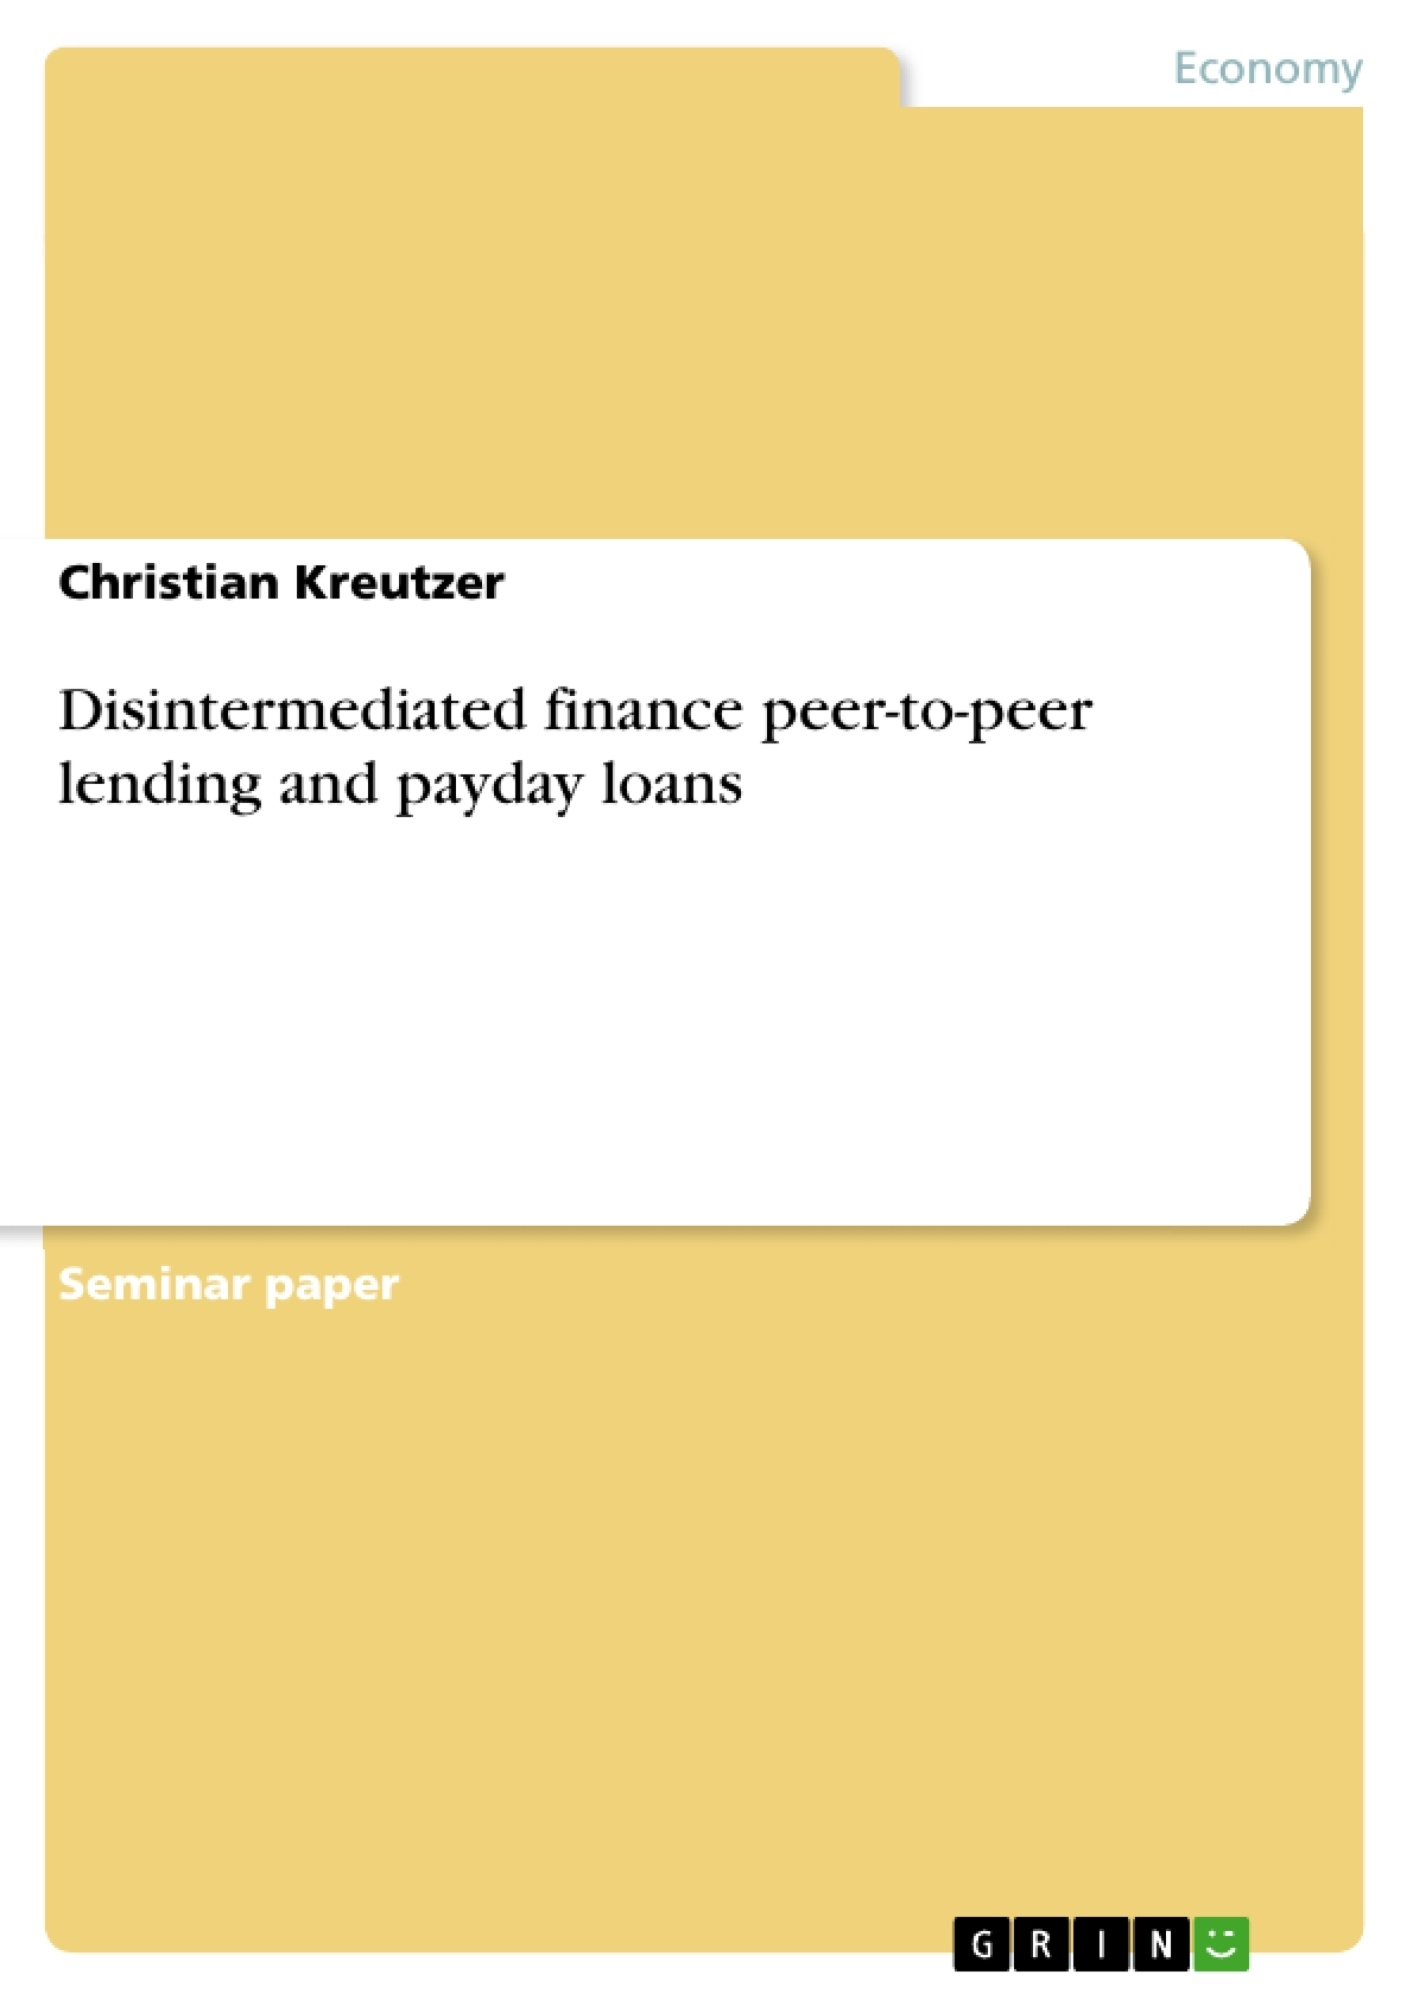 Title: Disintermediated finance peer-to-peer lending and payday loans